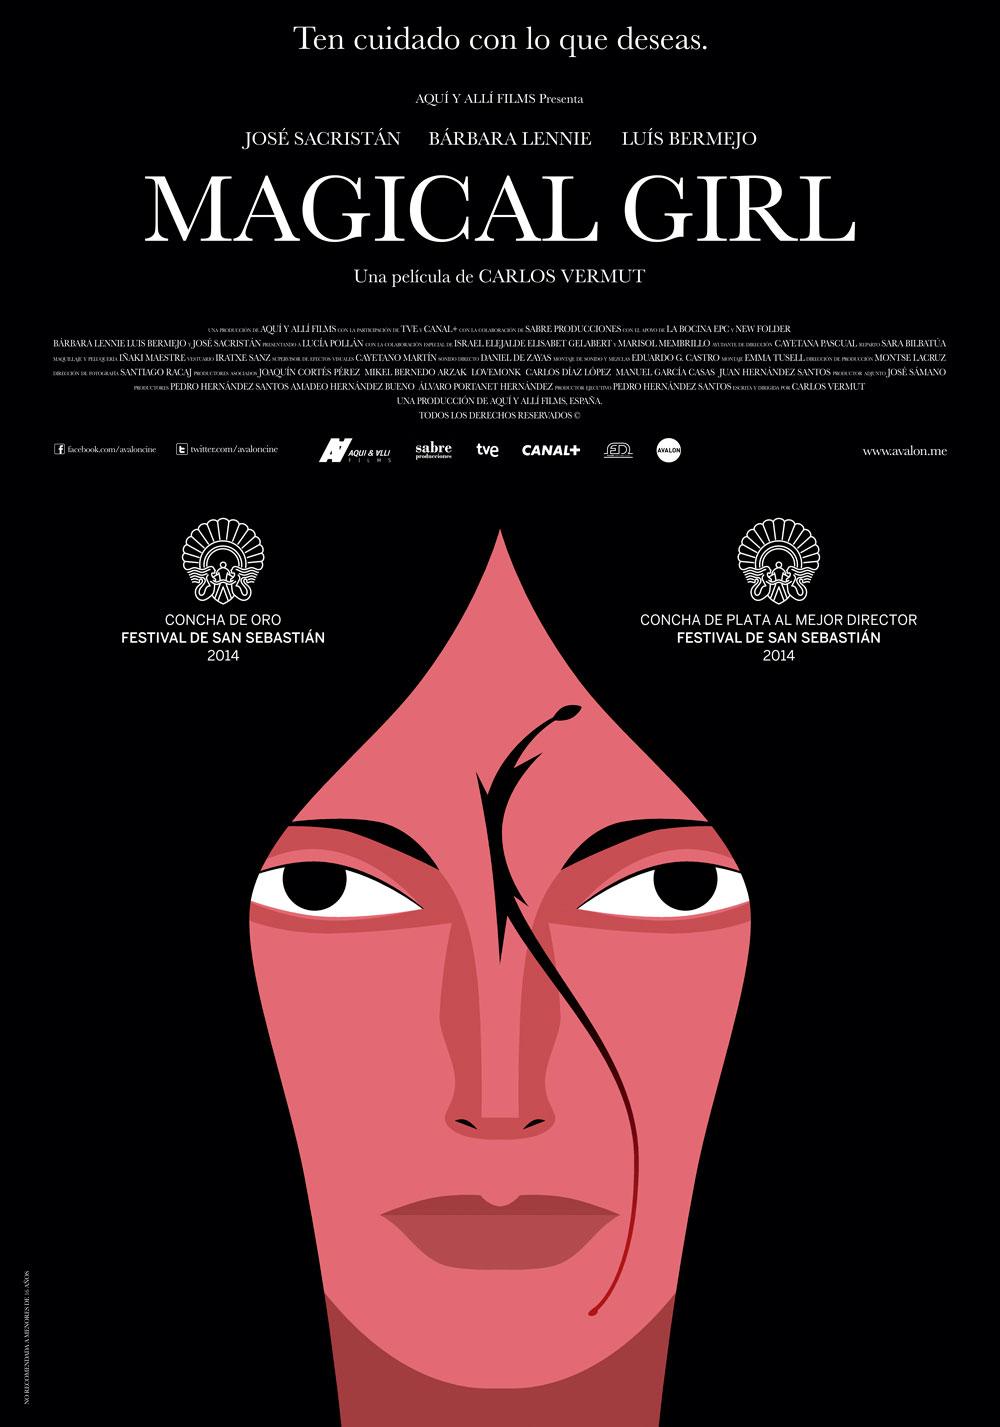 Magical Girl cartel. Fuente: Graffica http://graffica.info/carlos-vermut-cartel-magical-girl/